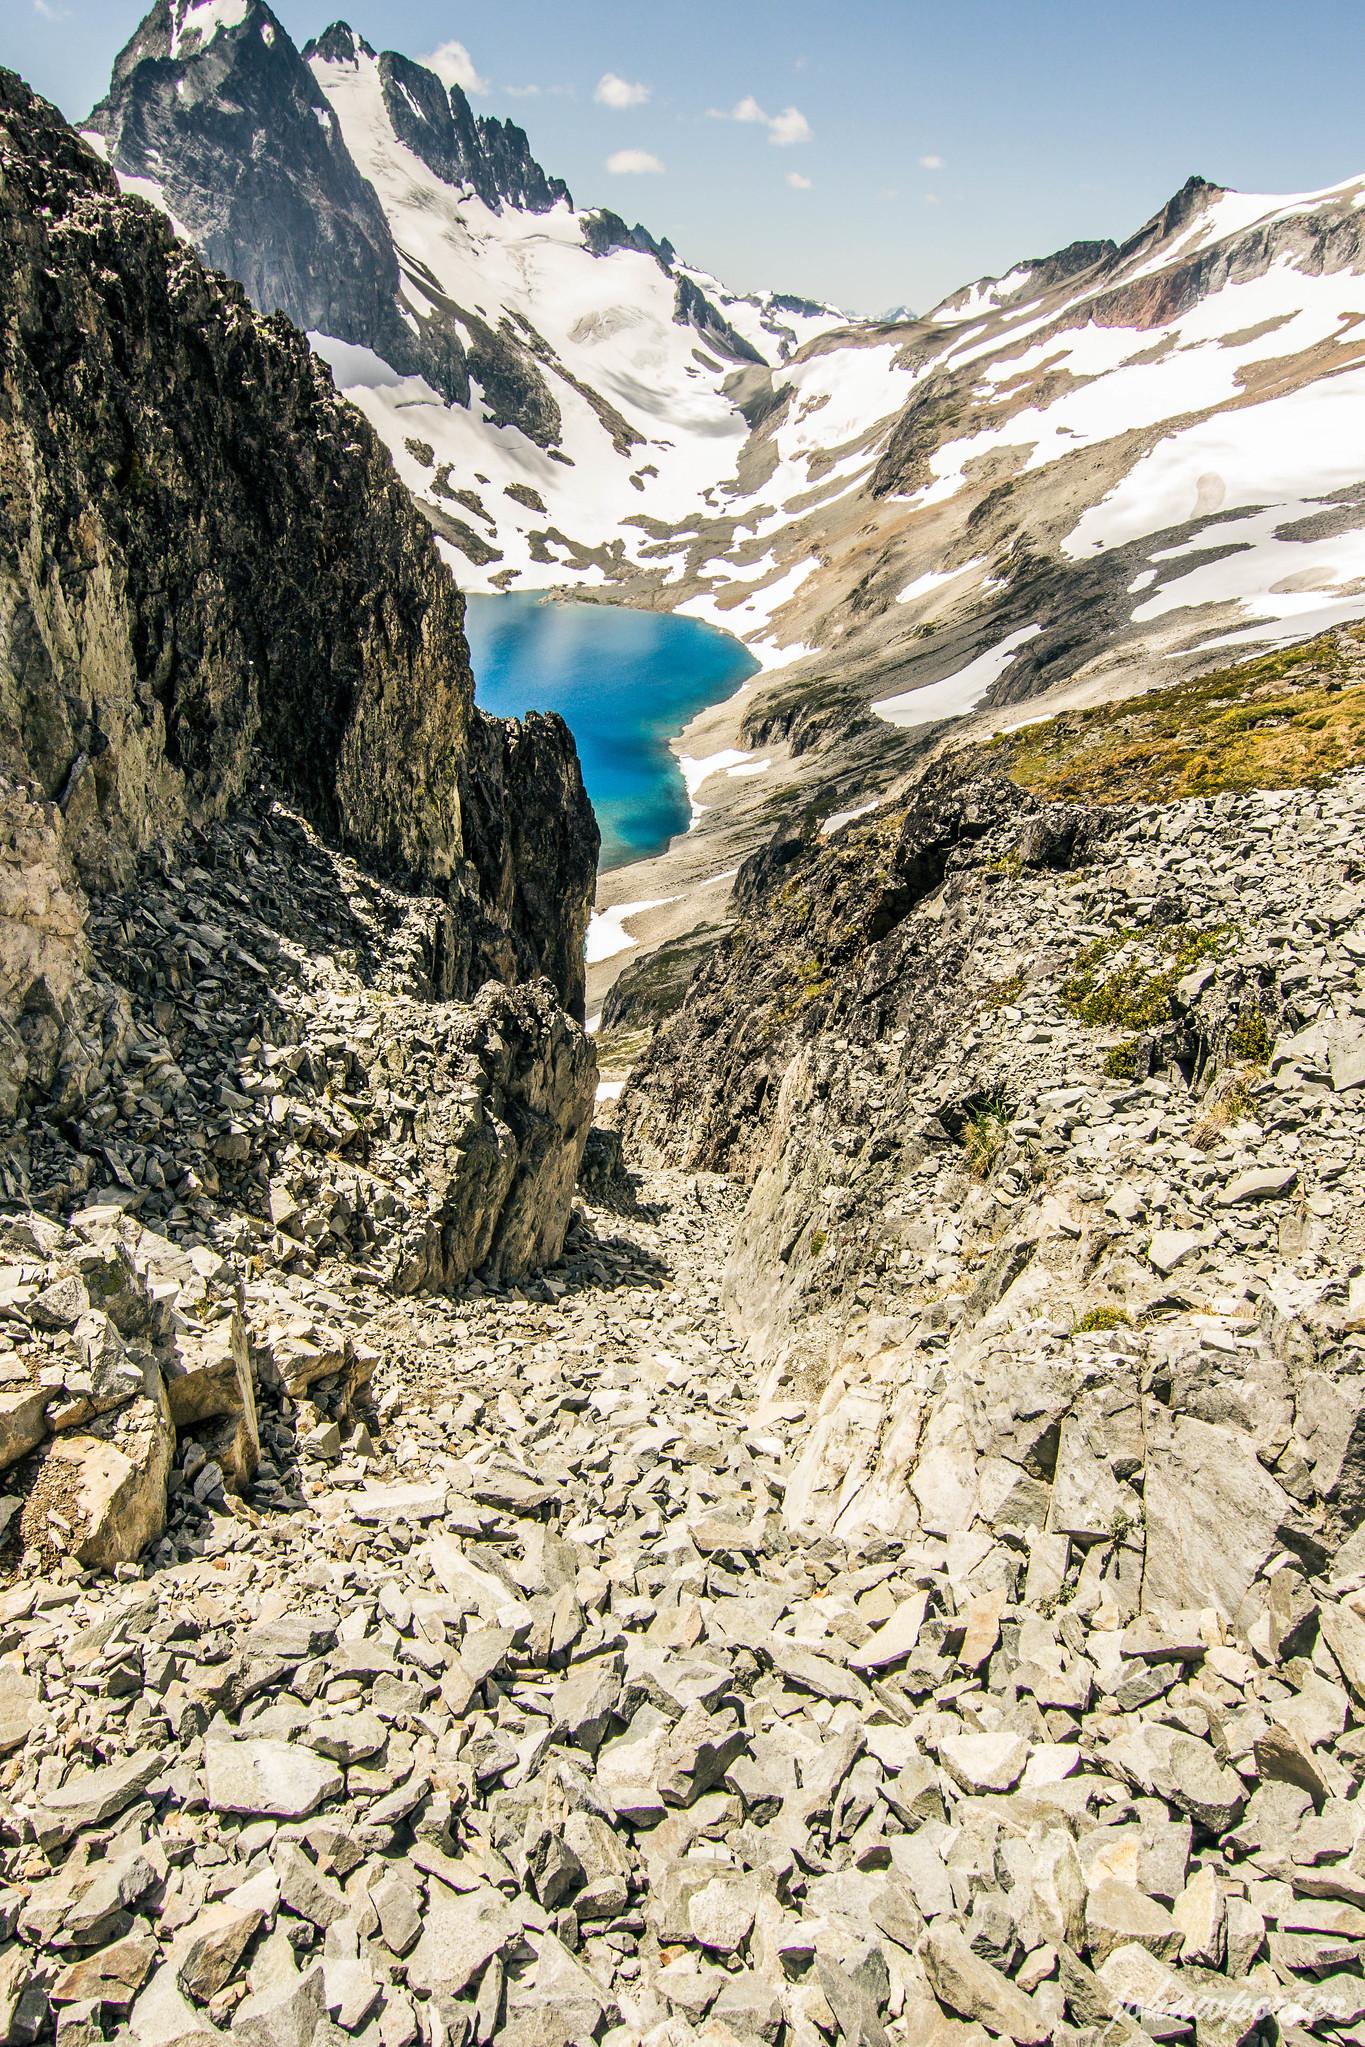 Class 3 gully below Mount Rahm